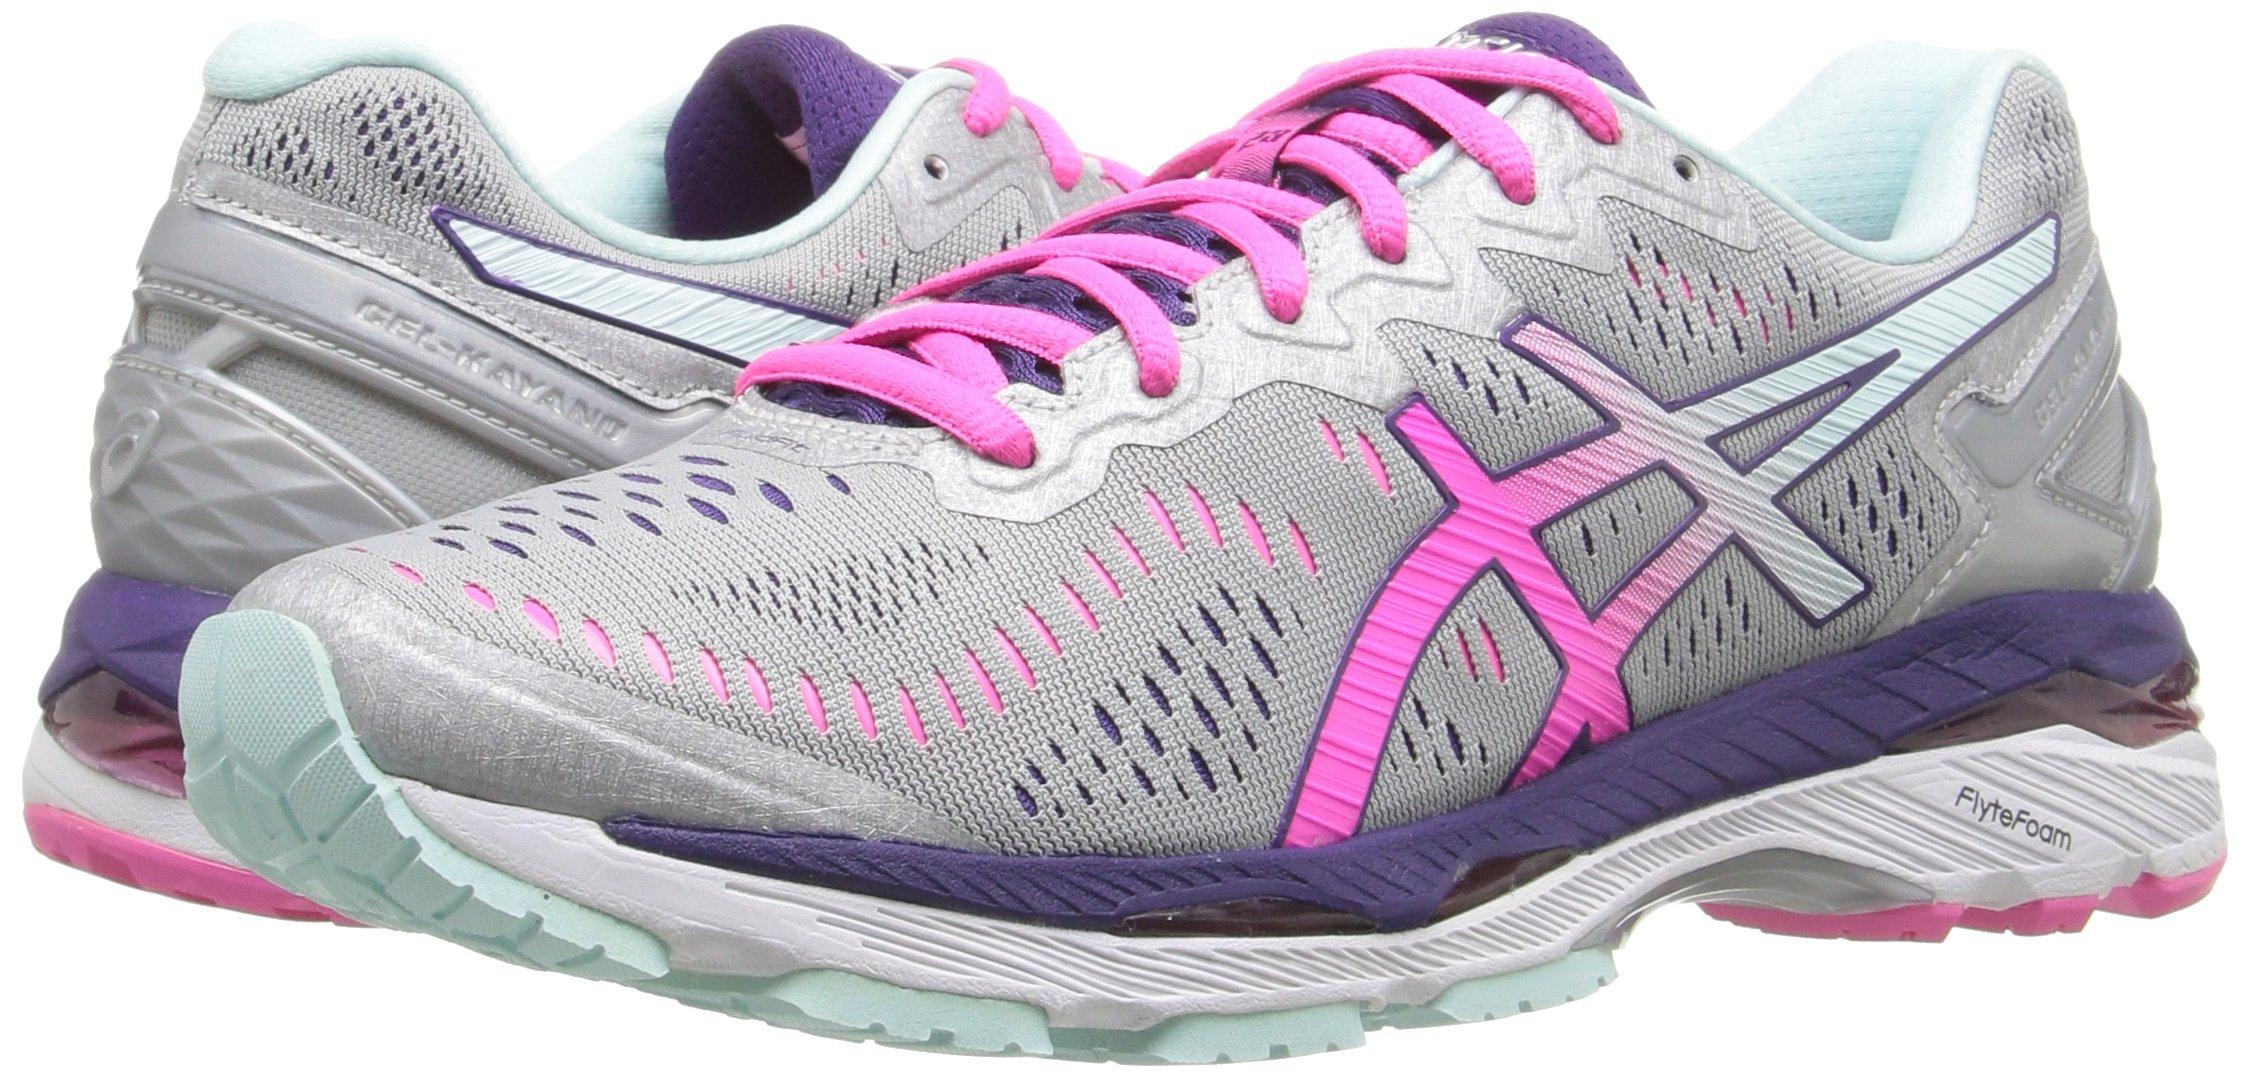 81ZavS8%2BRKL - ASICS Women's Gel-Kayano 23 Running Shoe, Silver/Pink Glow/Parachute Purple, 5.5 UK